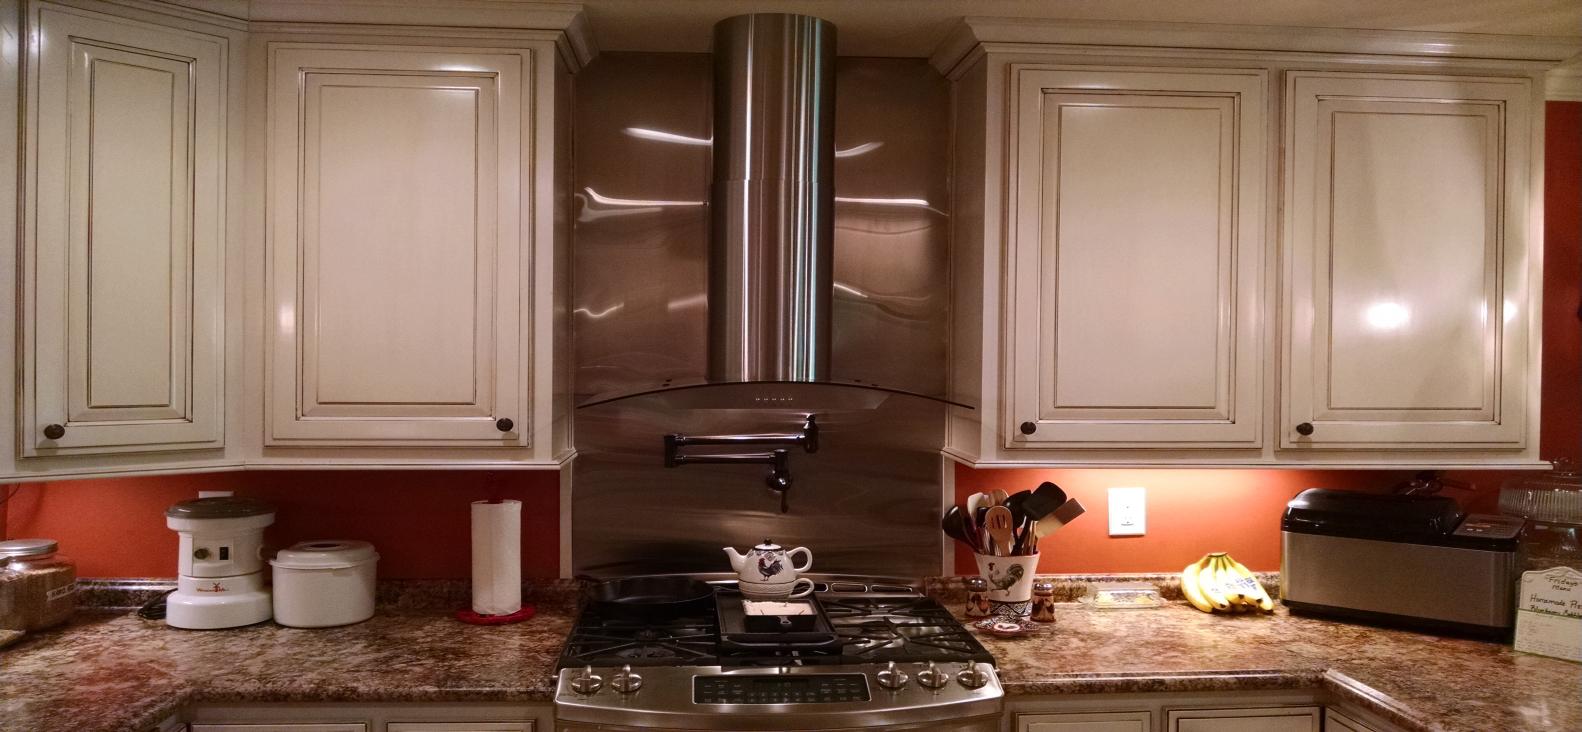 kitchen remodel kitchen remodeling companies Cullman Alabama s Kitchen Remodeling Company